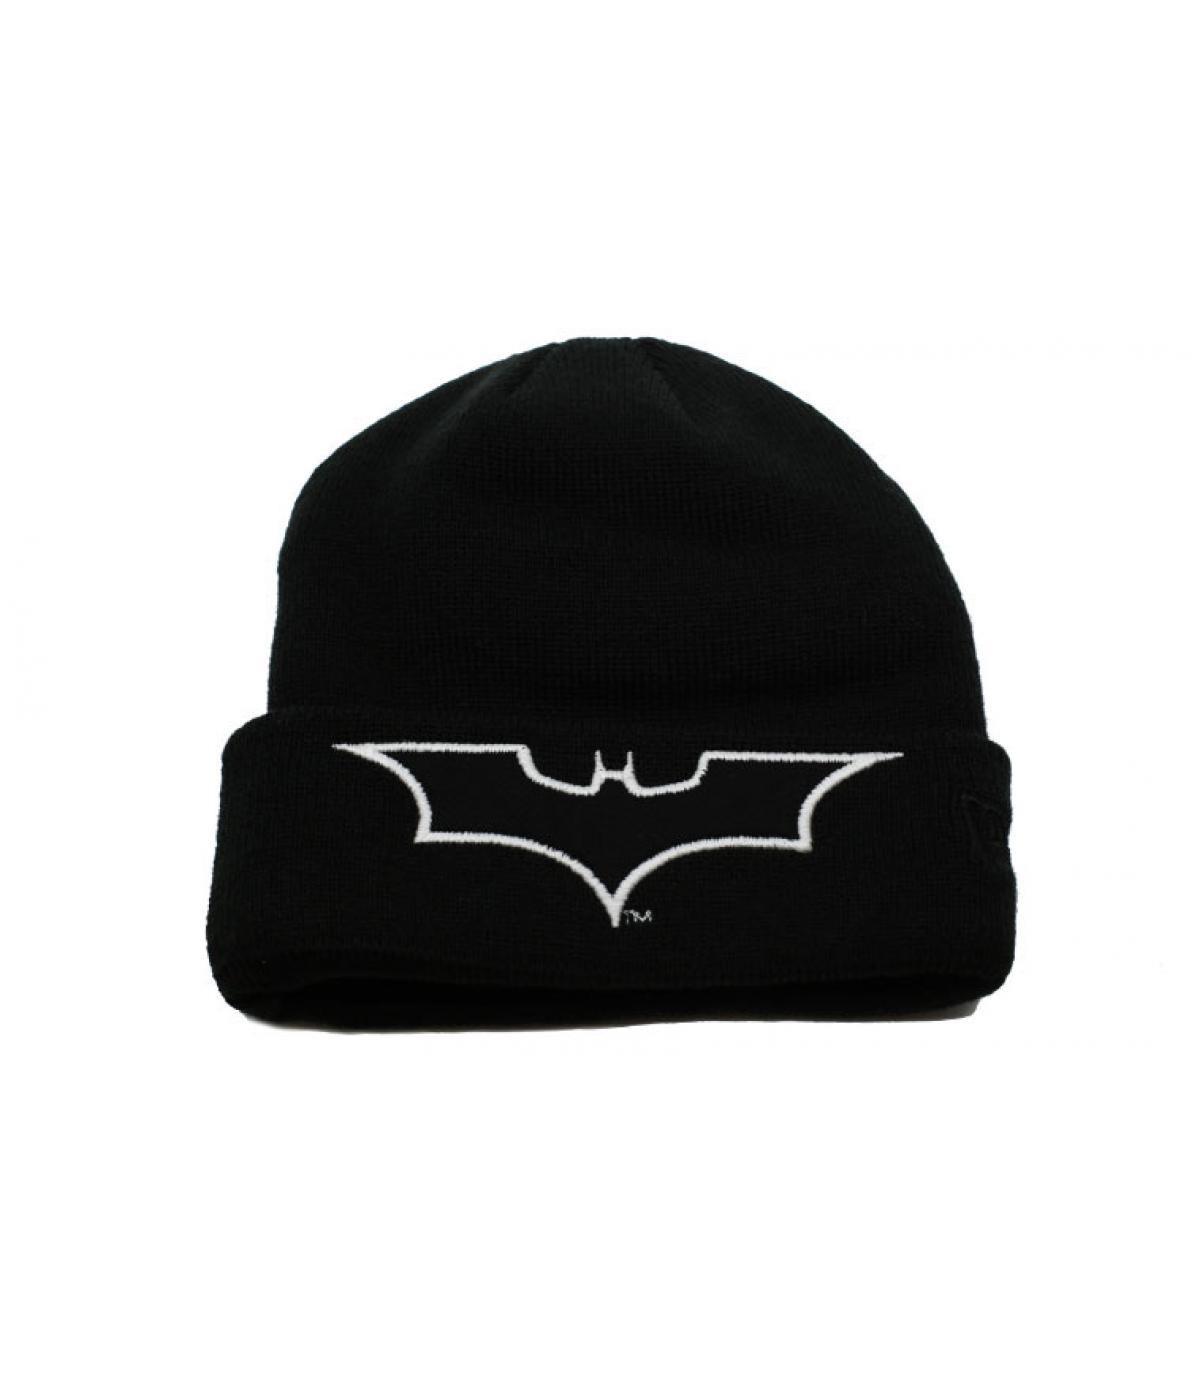 Details Kids GITD Knit Batman - afbeeling 2